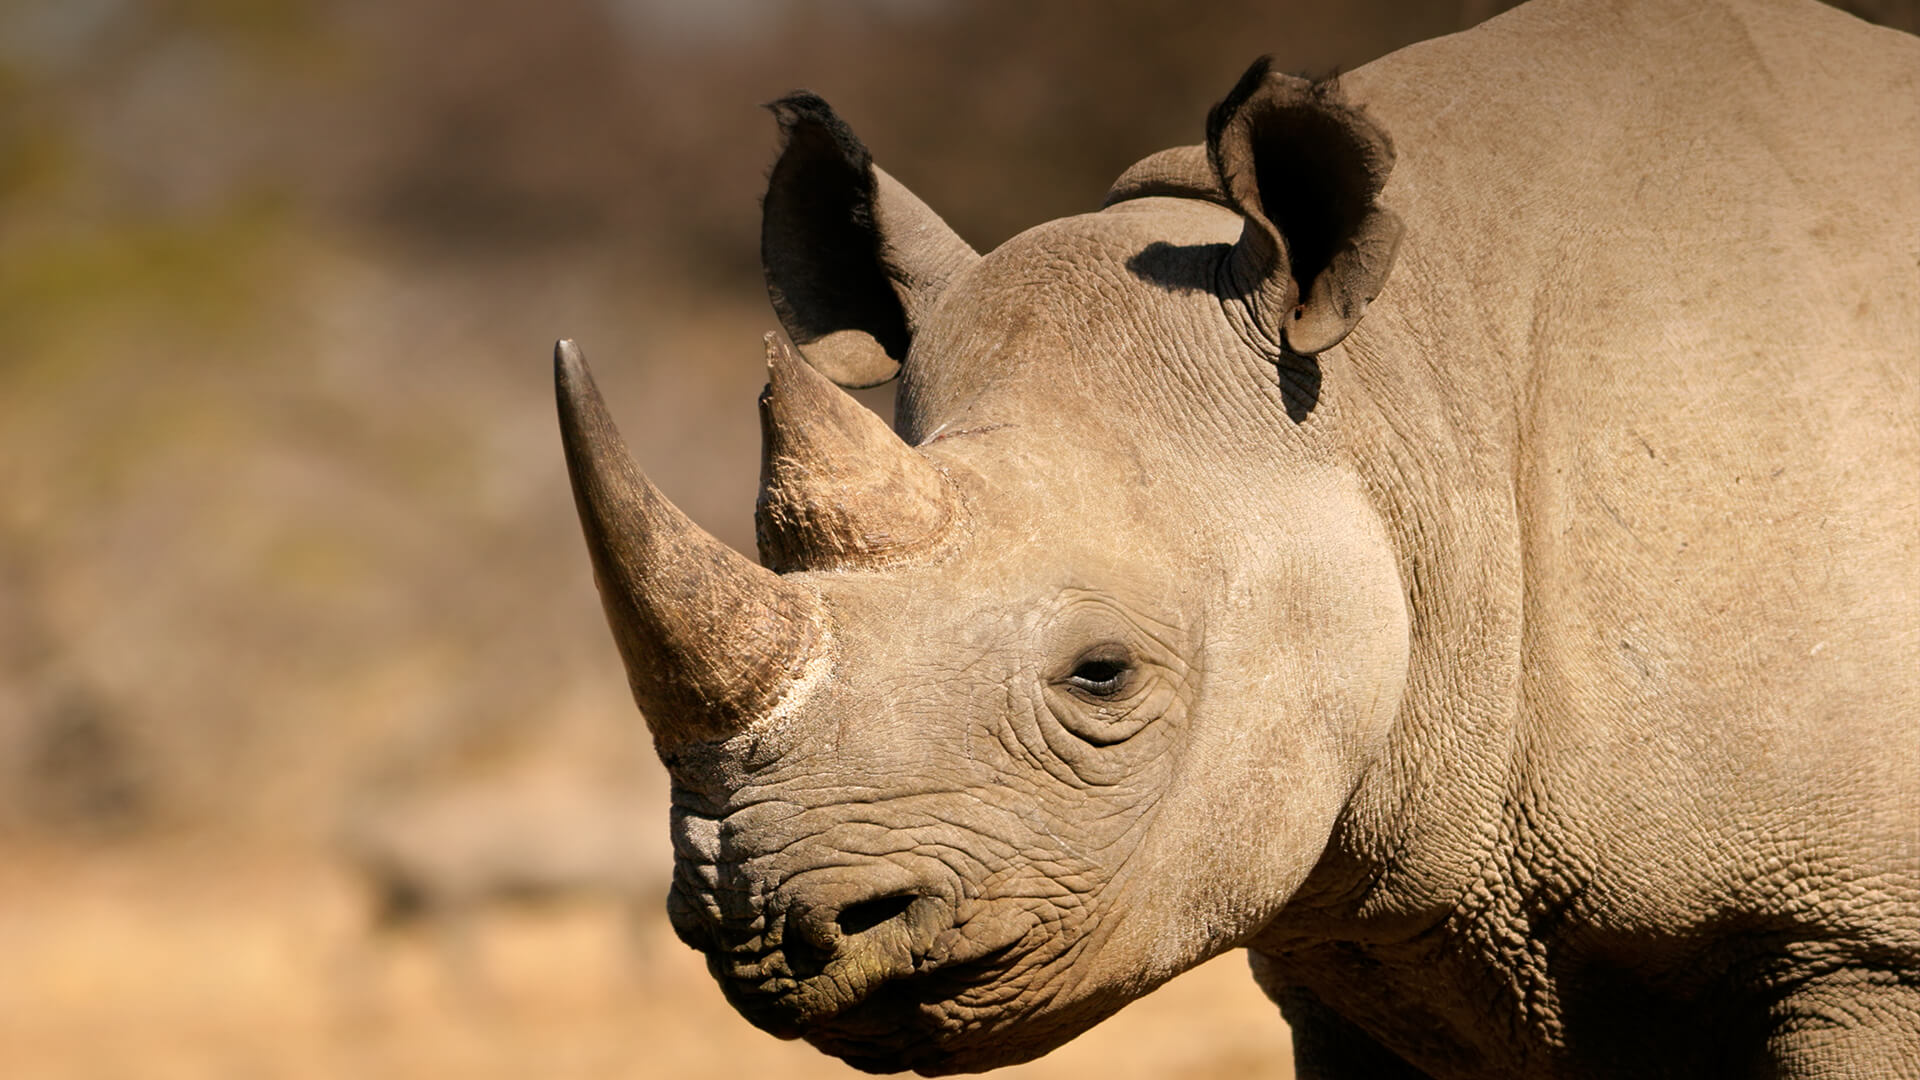 Rhinoceros | San Diego Zoo Animals & Plants